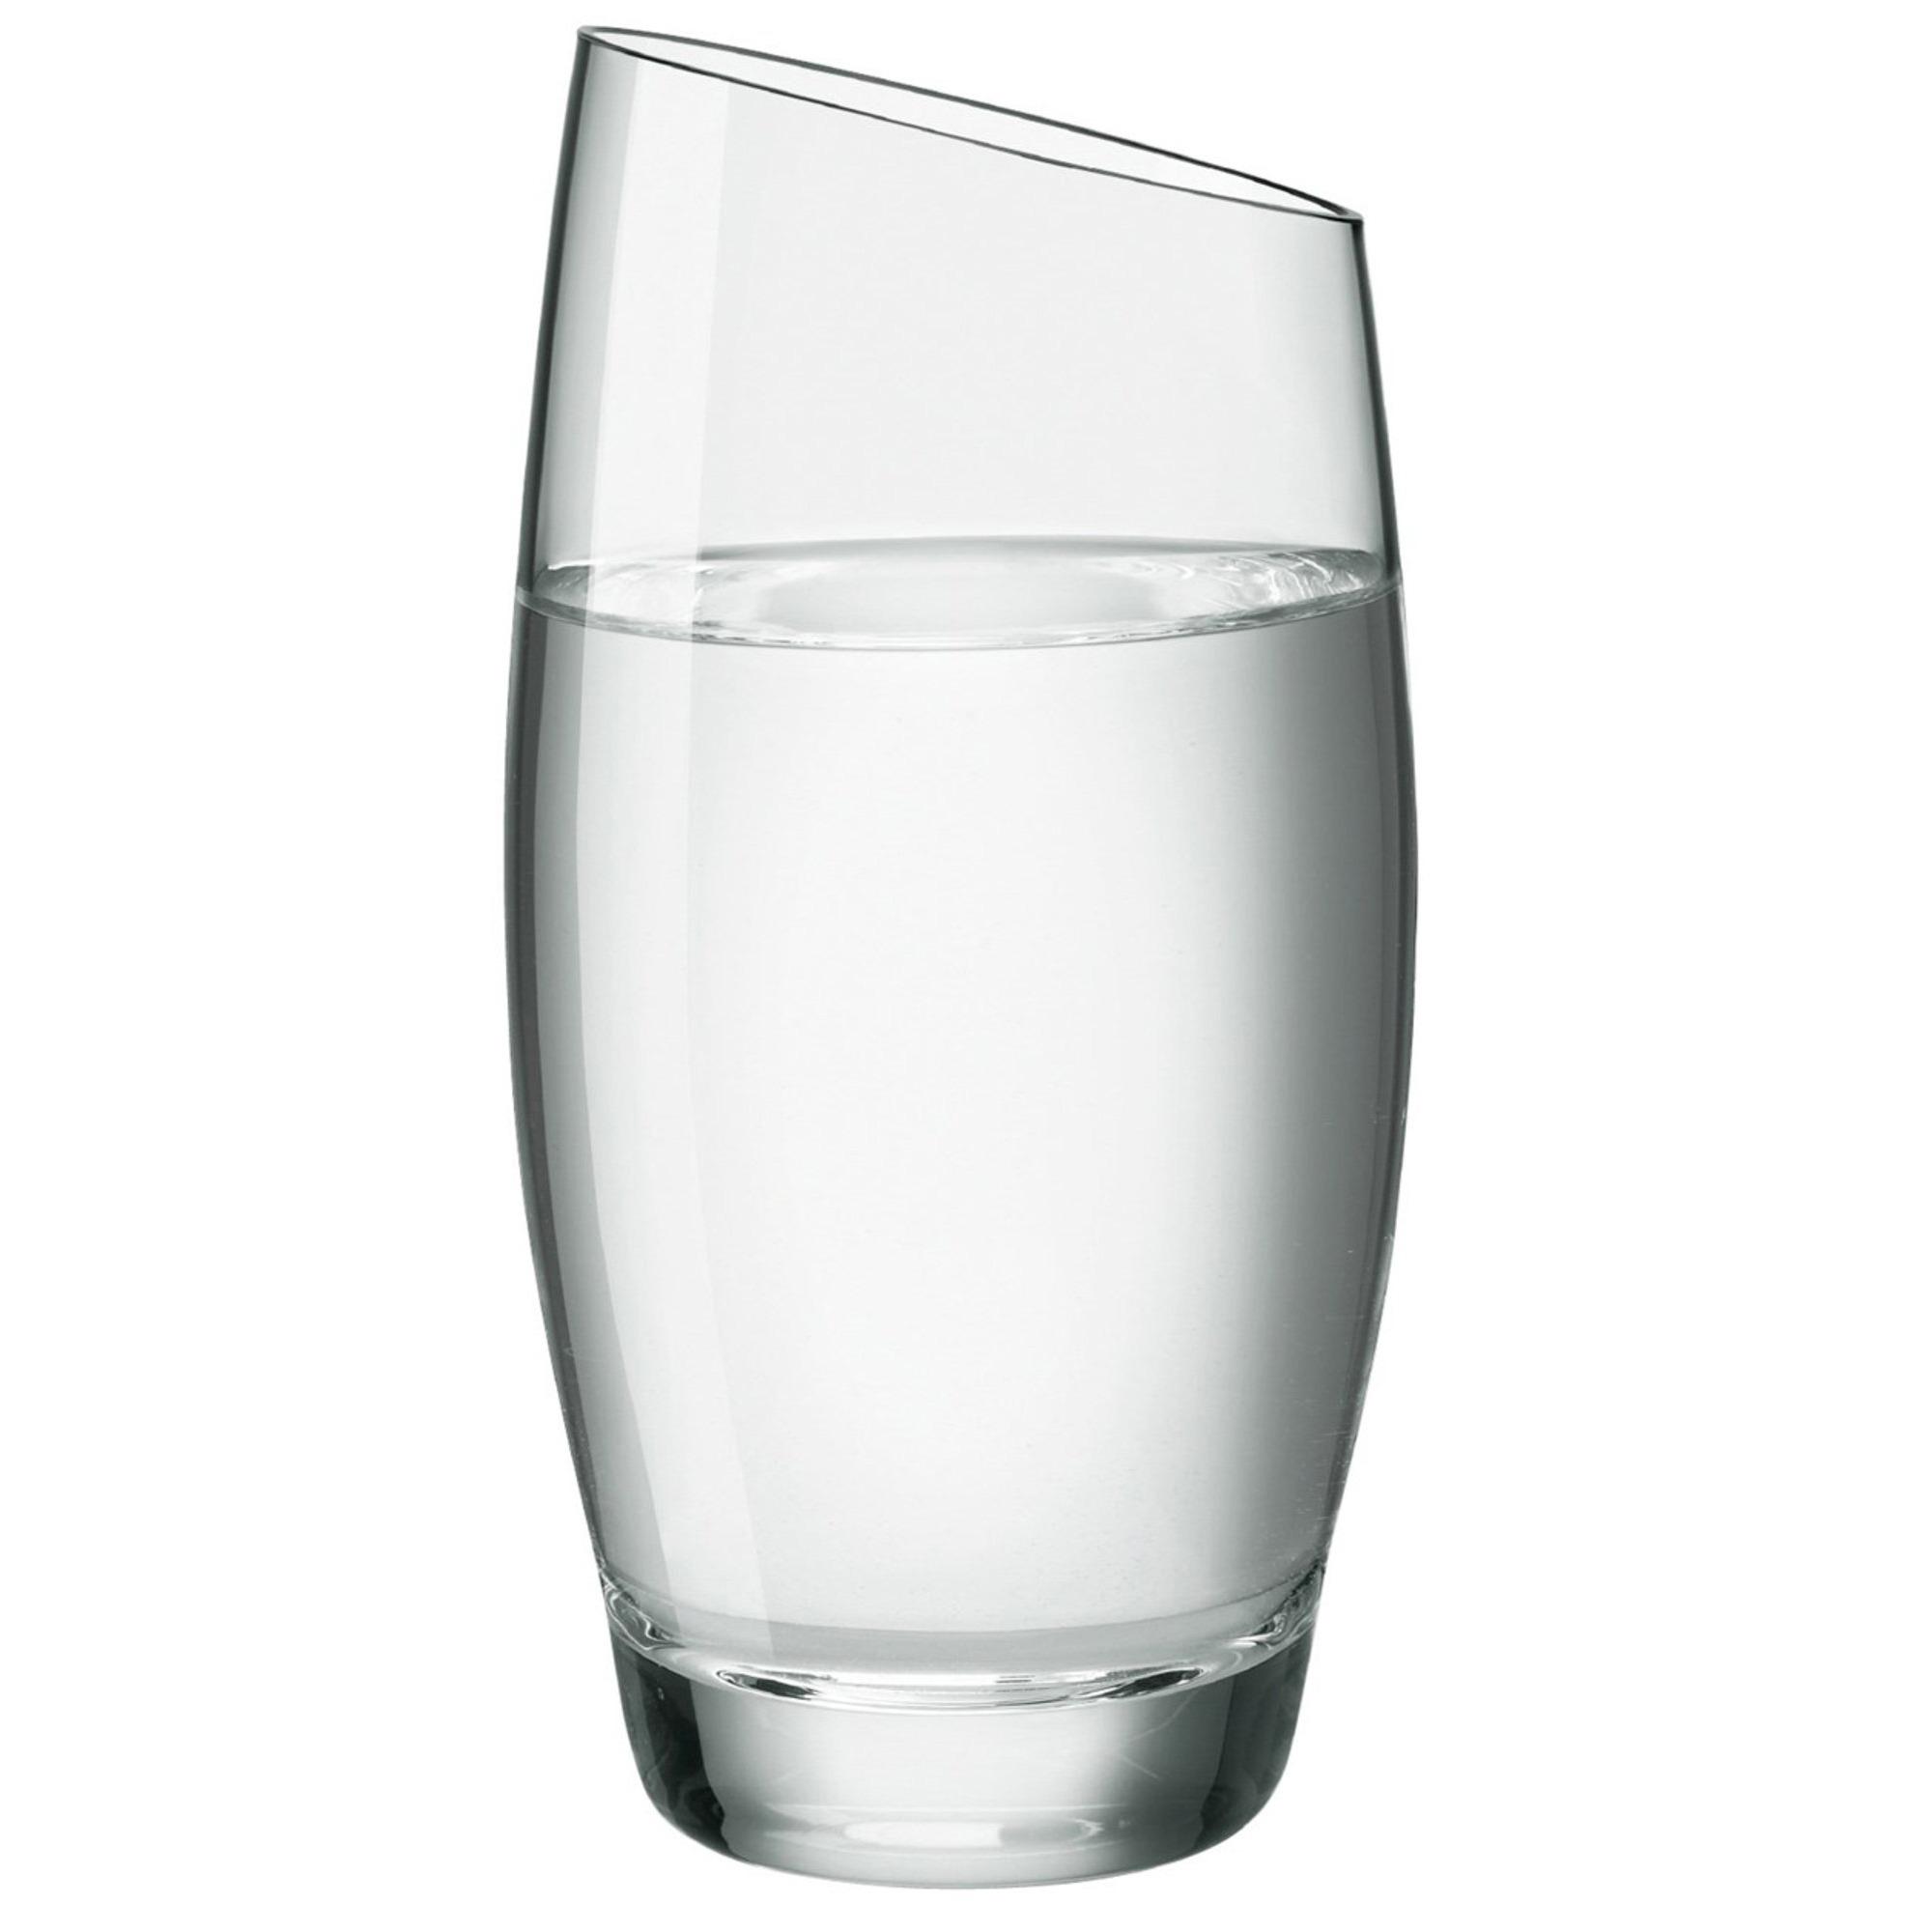 Eva Solo Vattenglas 35 cl